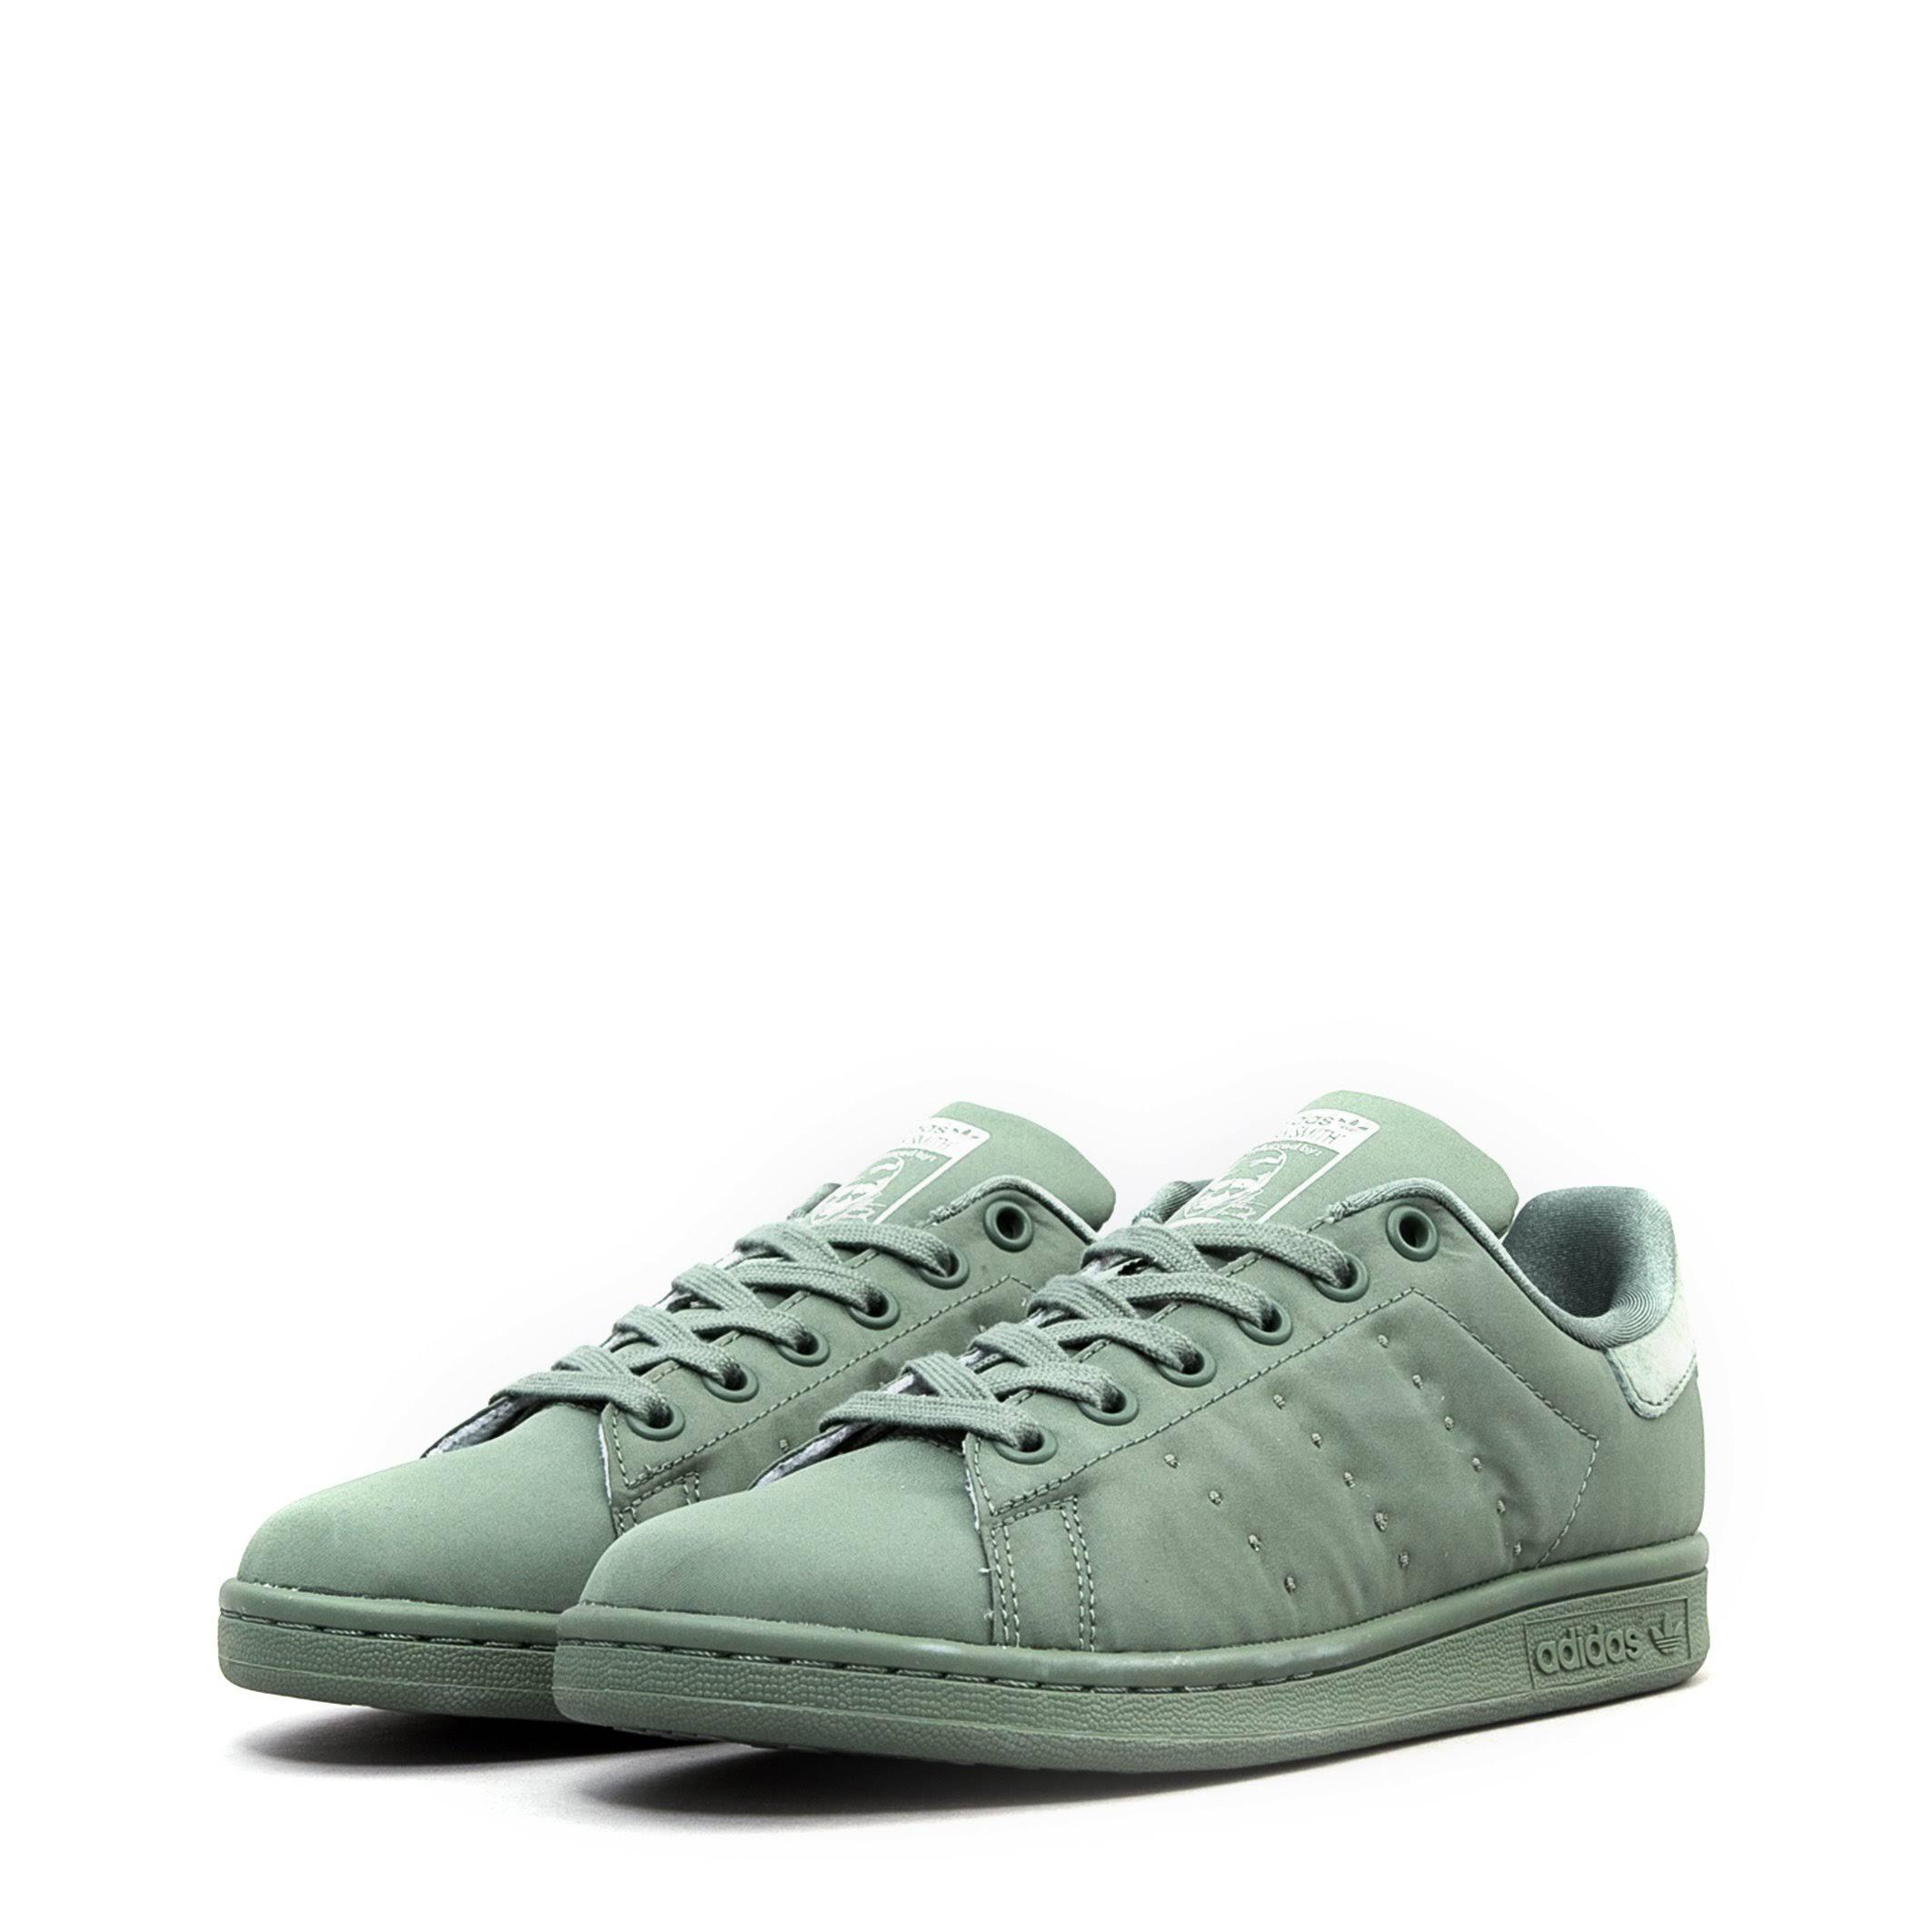 Green Lightgreen 4 AdidasStansmithw AdidasStansmithw Green 5 AdidasStansmithw 5 Lightgreen 4 NvwmnO08